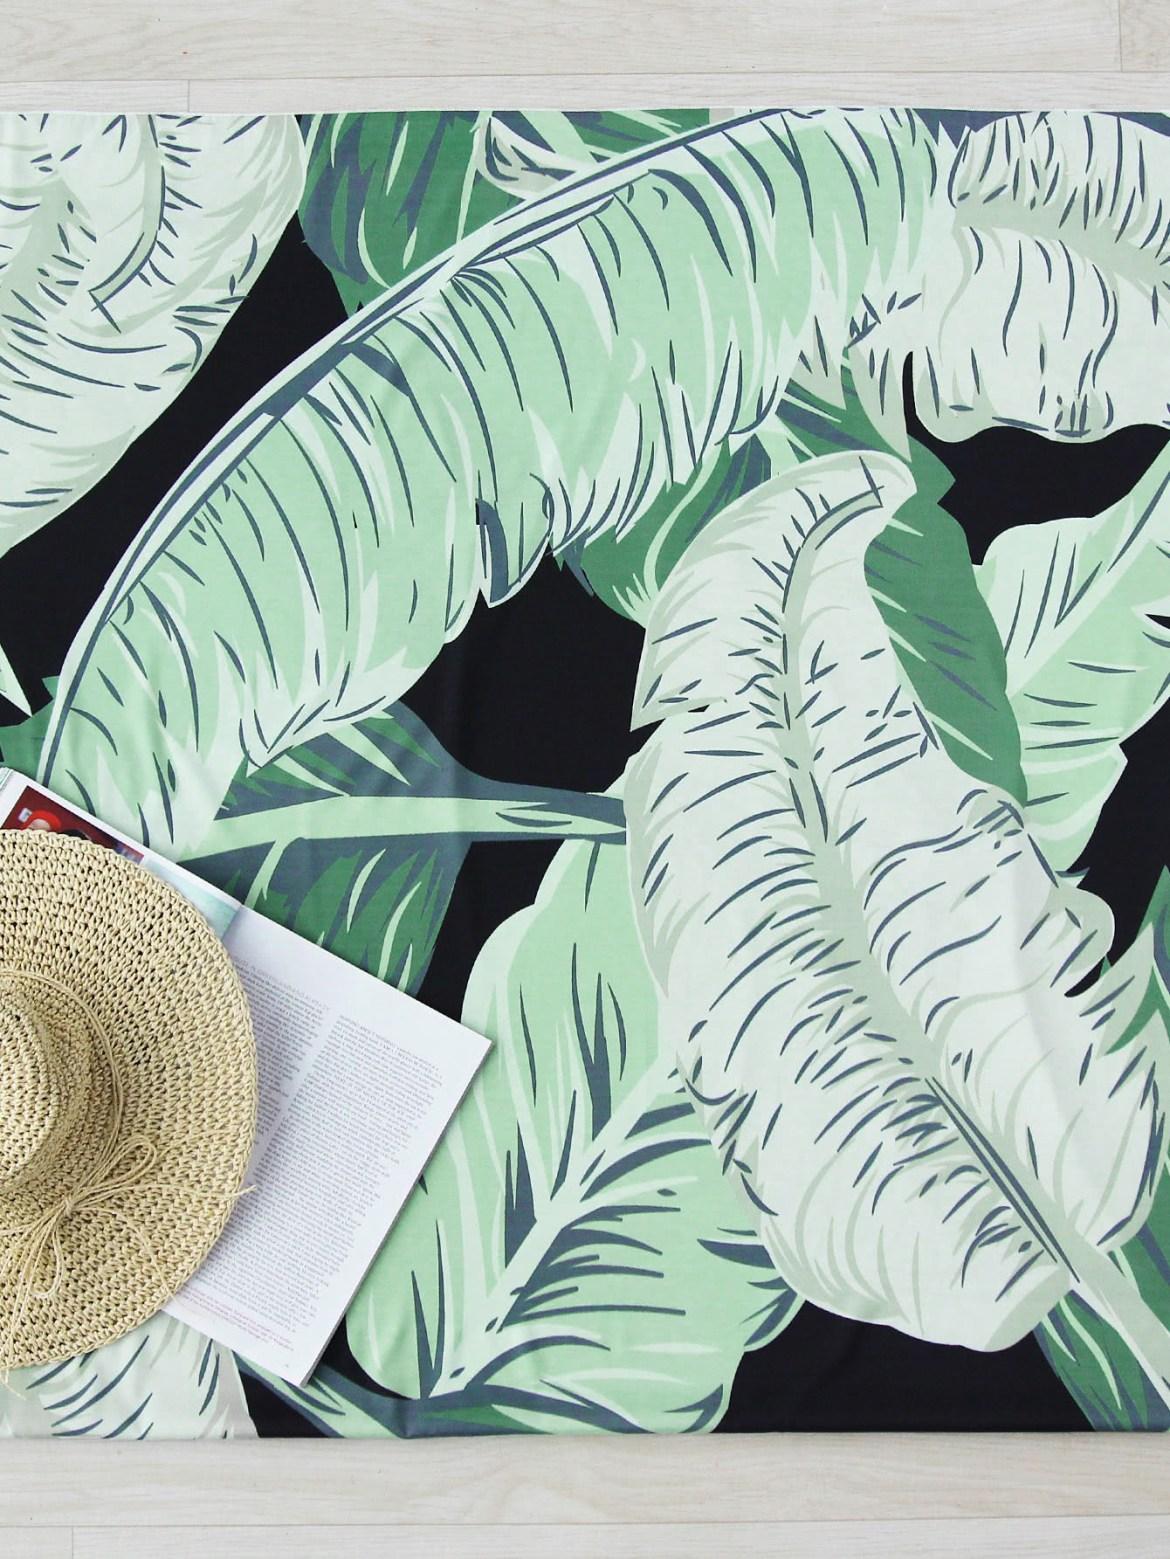 shein bañador low cost trendy two carmen marta españa moda fashion